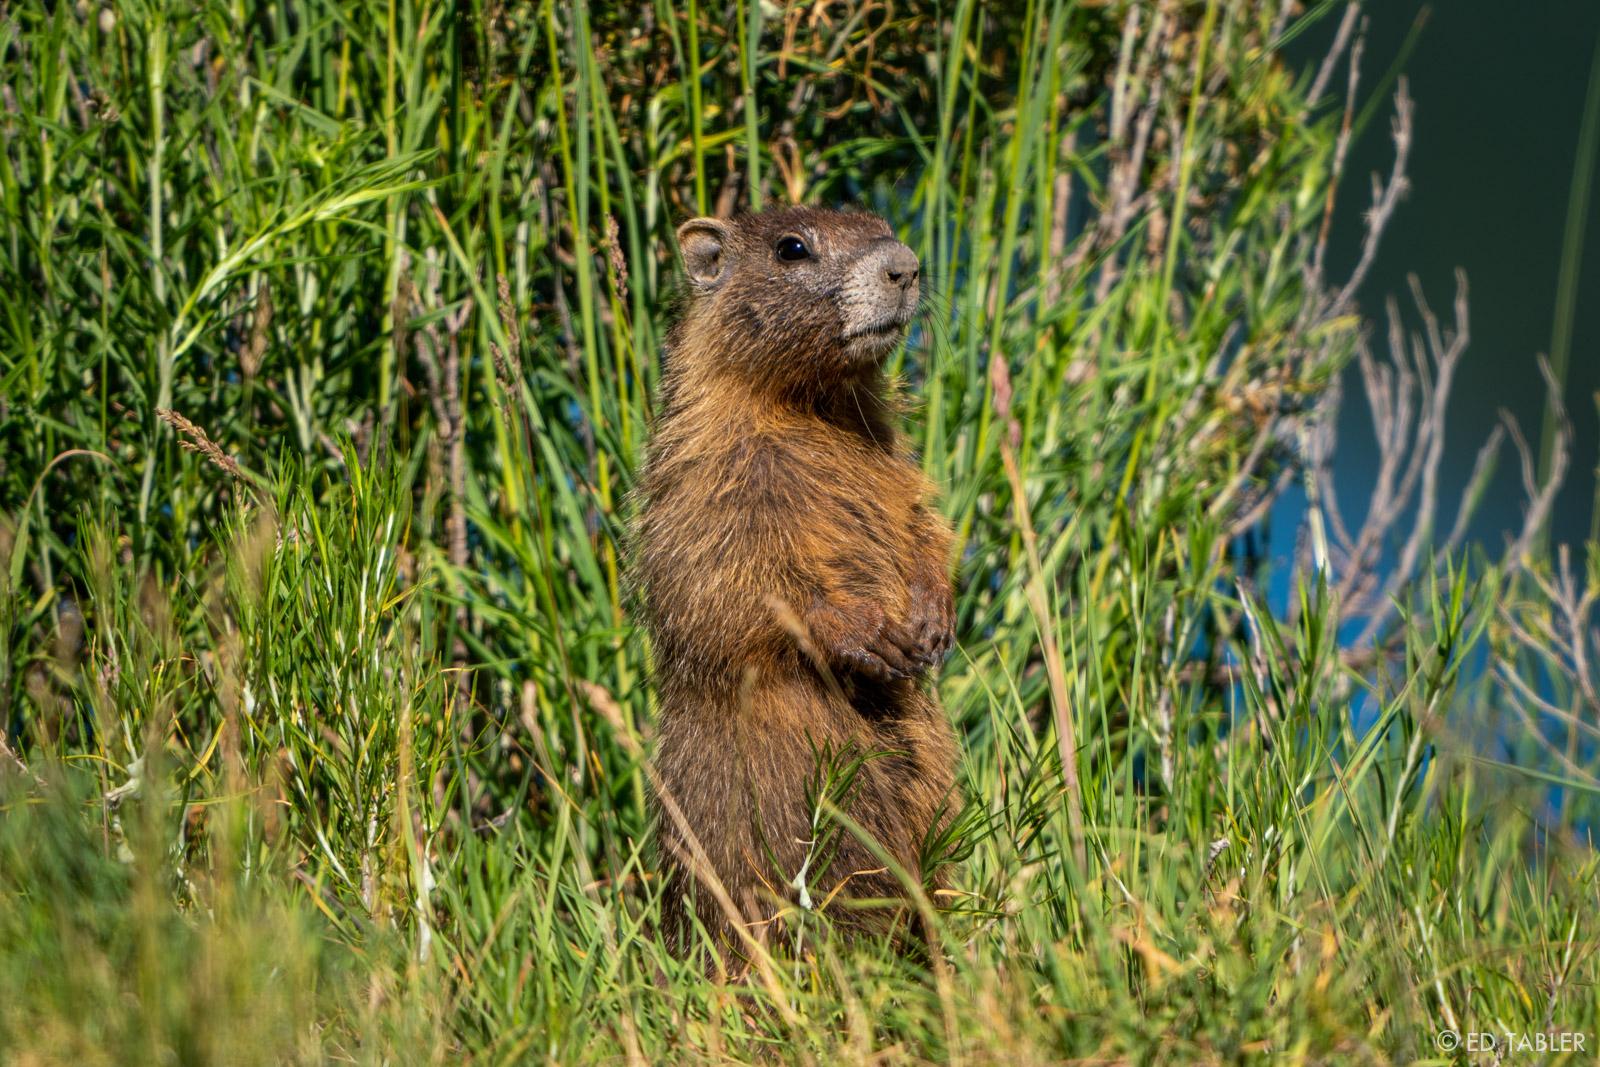 A marmot ponders the odd presence of a lone photographer.